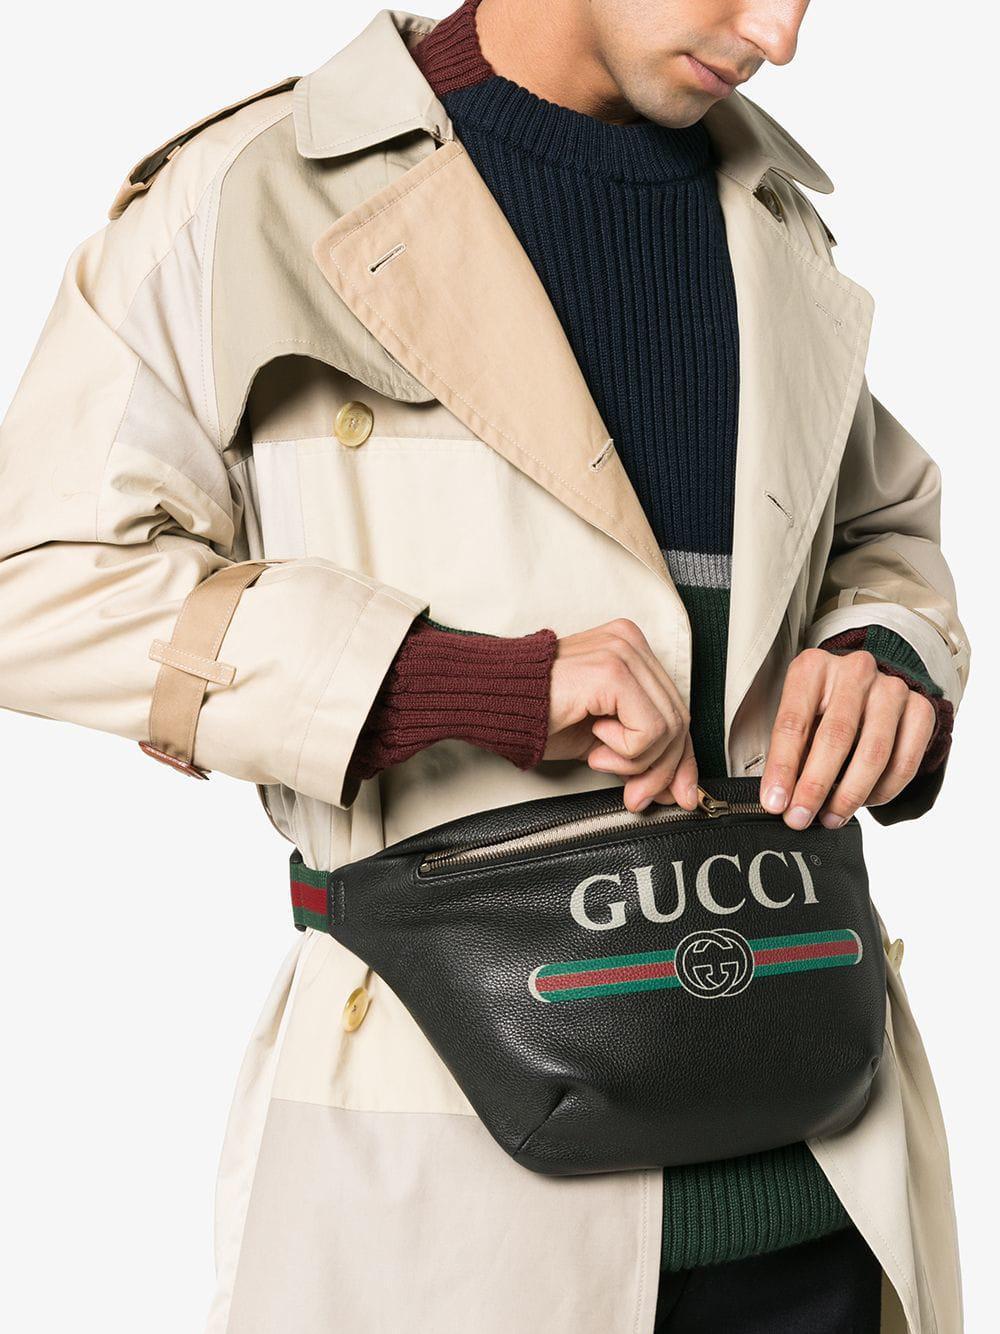 e88496e6c5e Gucci - Black Print Leather Belt Bag for Men - Lyst. View fullscreen